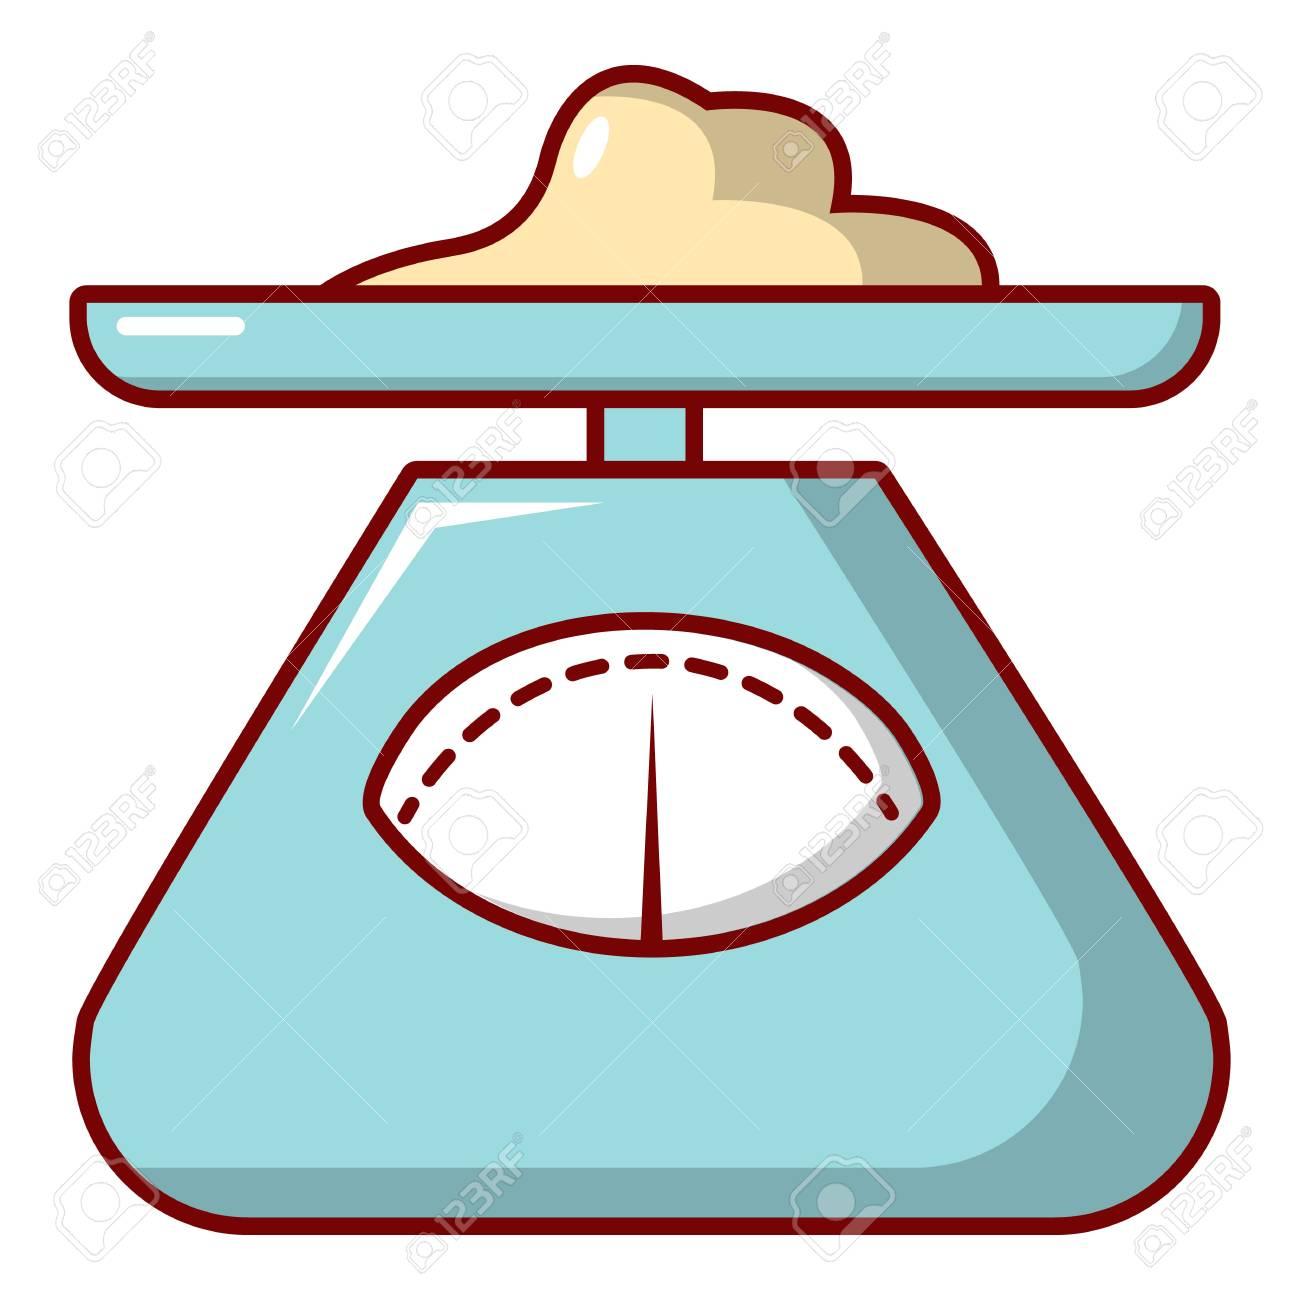 Balanza De Cocina Icono. Ilustración De Dibujos Animados De Balanzas ...